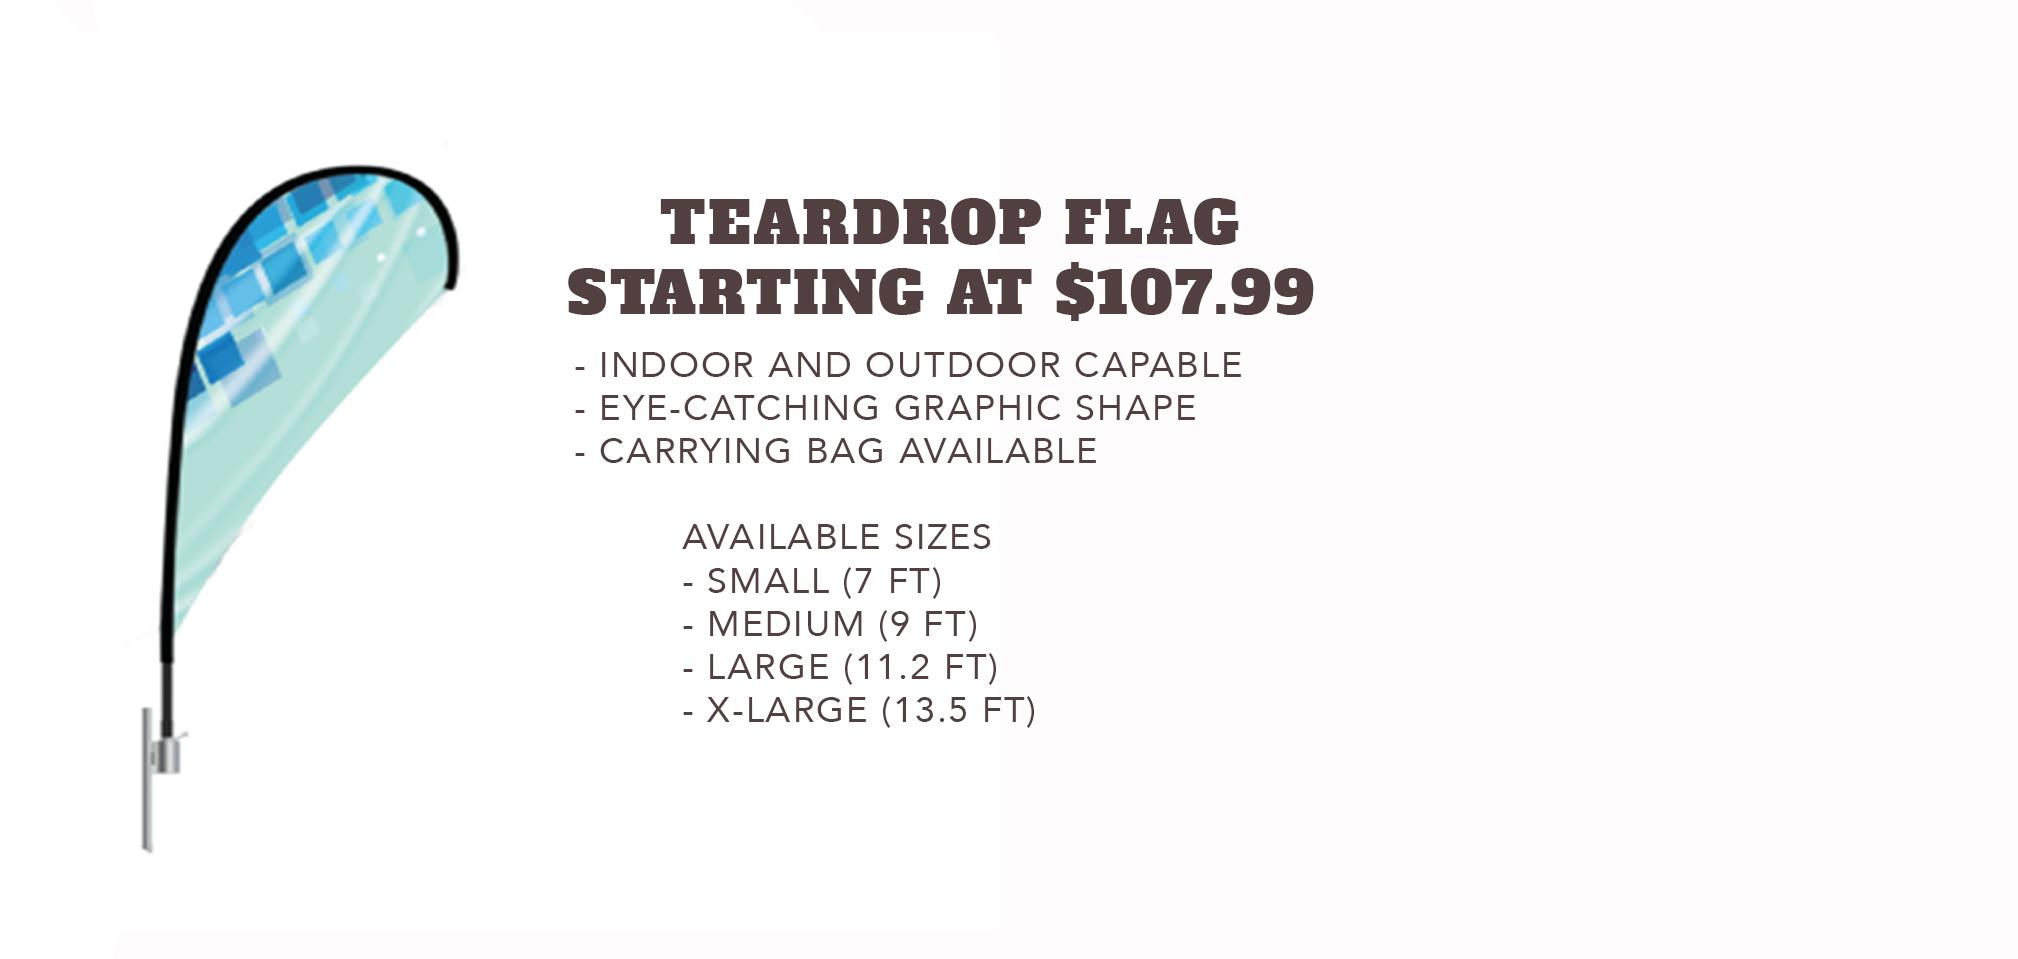 Teardrop Flags - Starting at $107.99